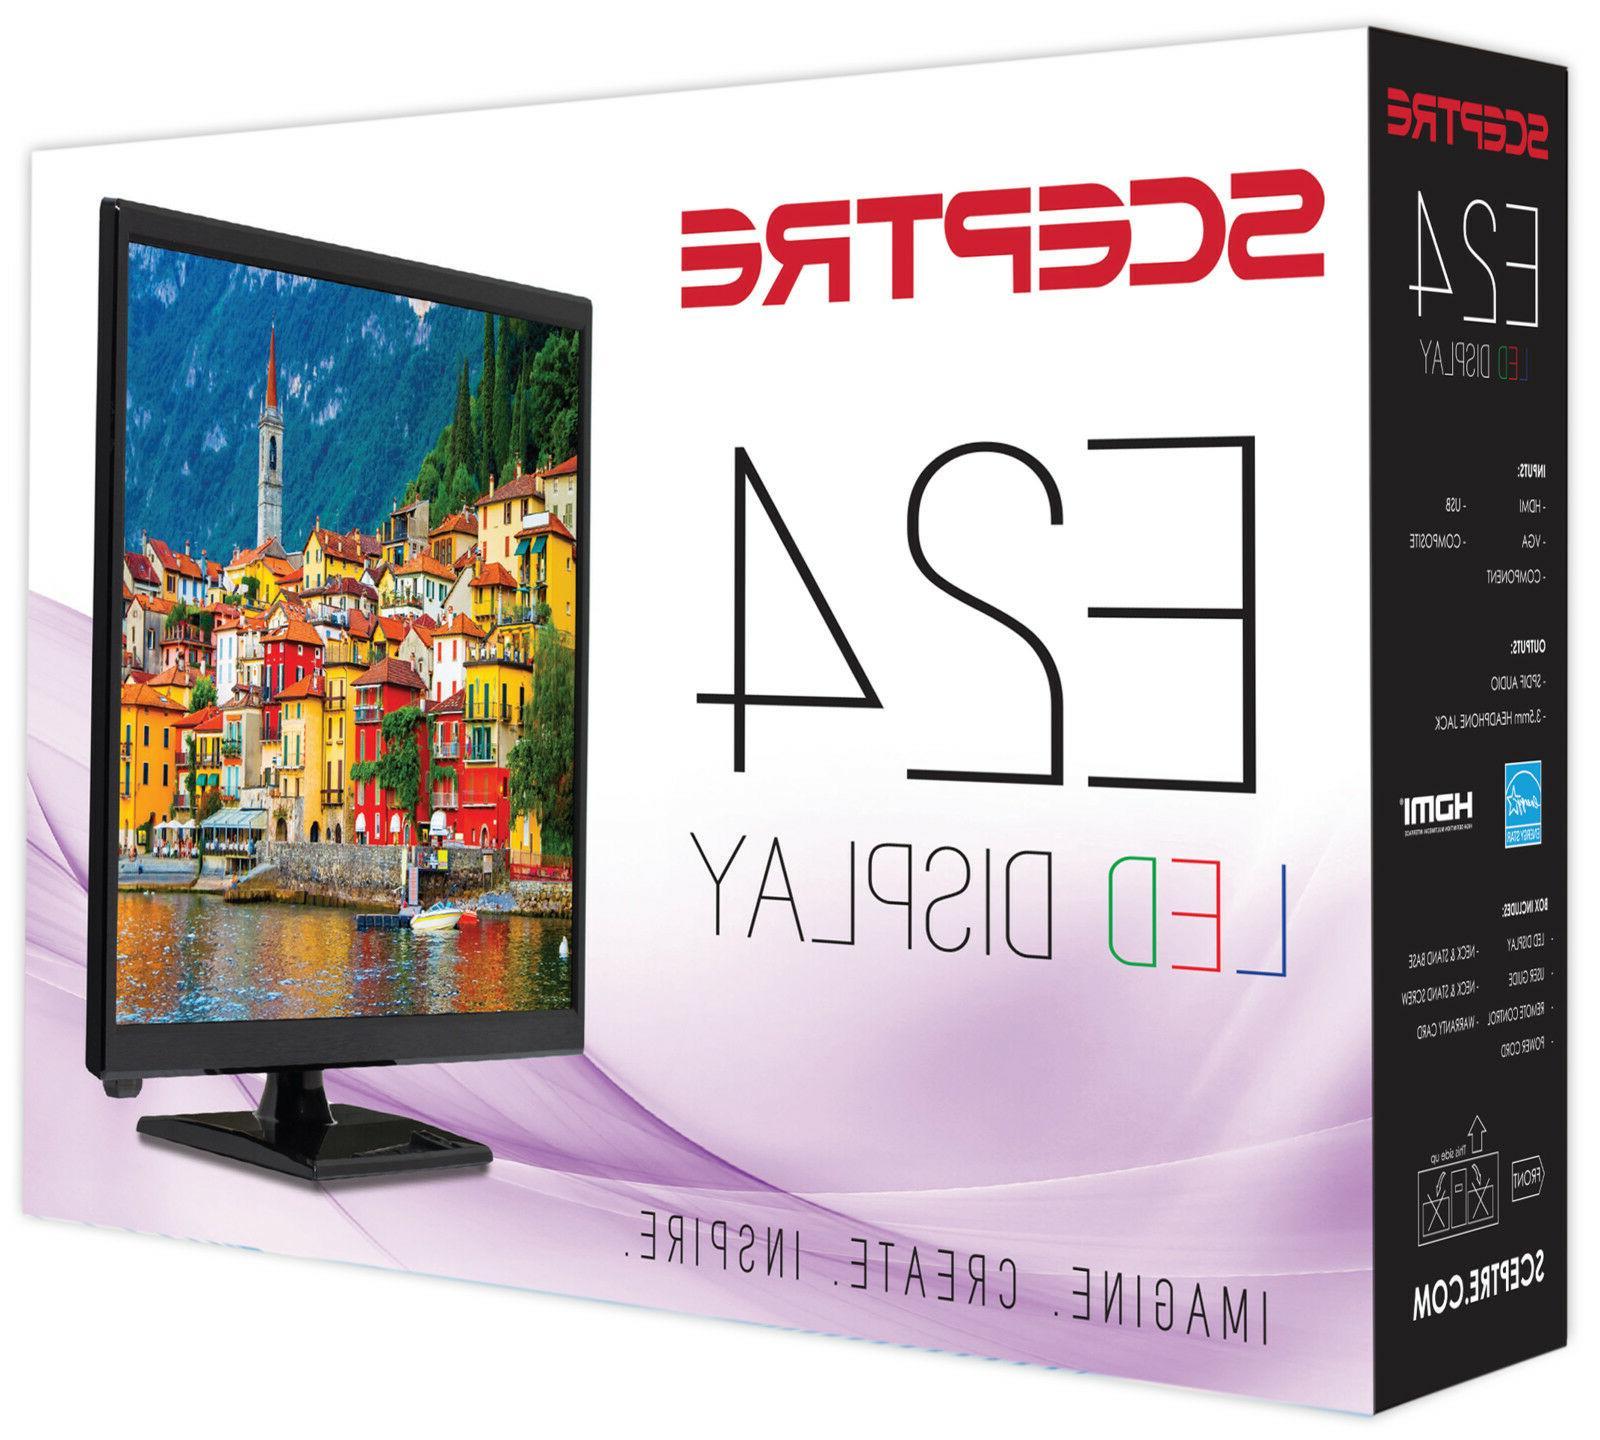 "Sceptre 24"" HD LED TV DVD Player"